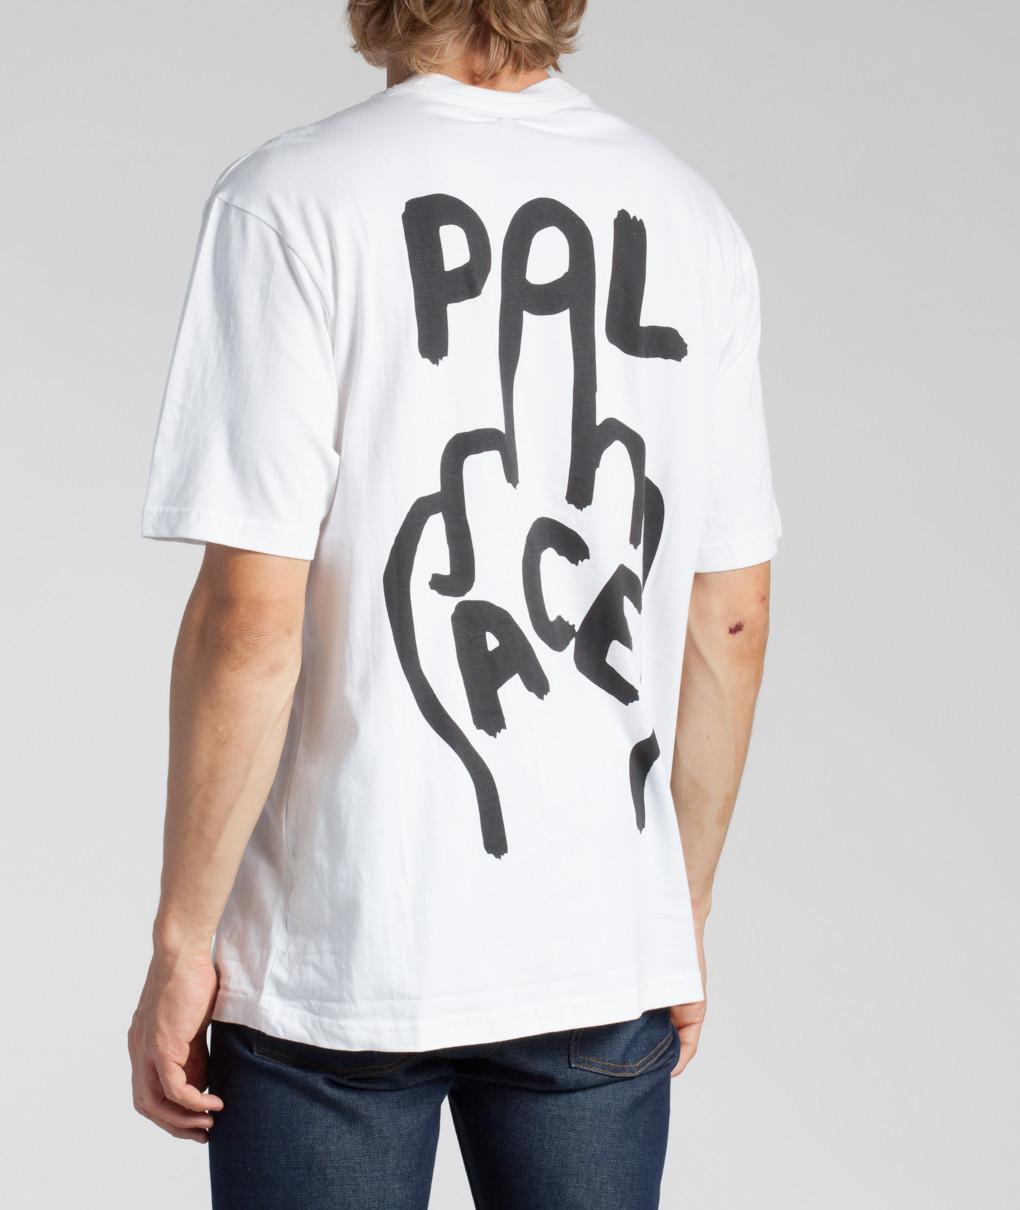 Футболка Палас | БИРКИ | Футболка PALACE finger мужская